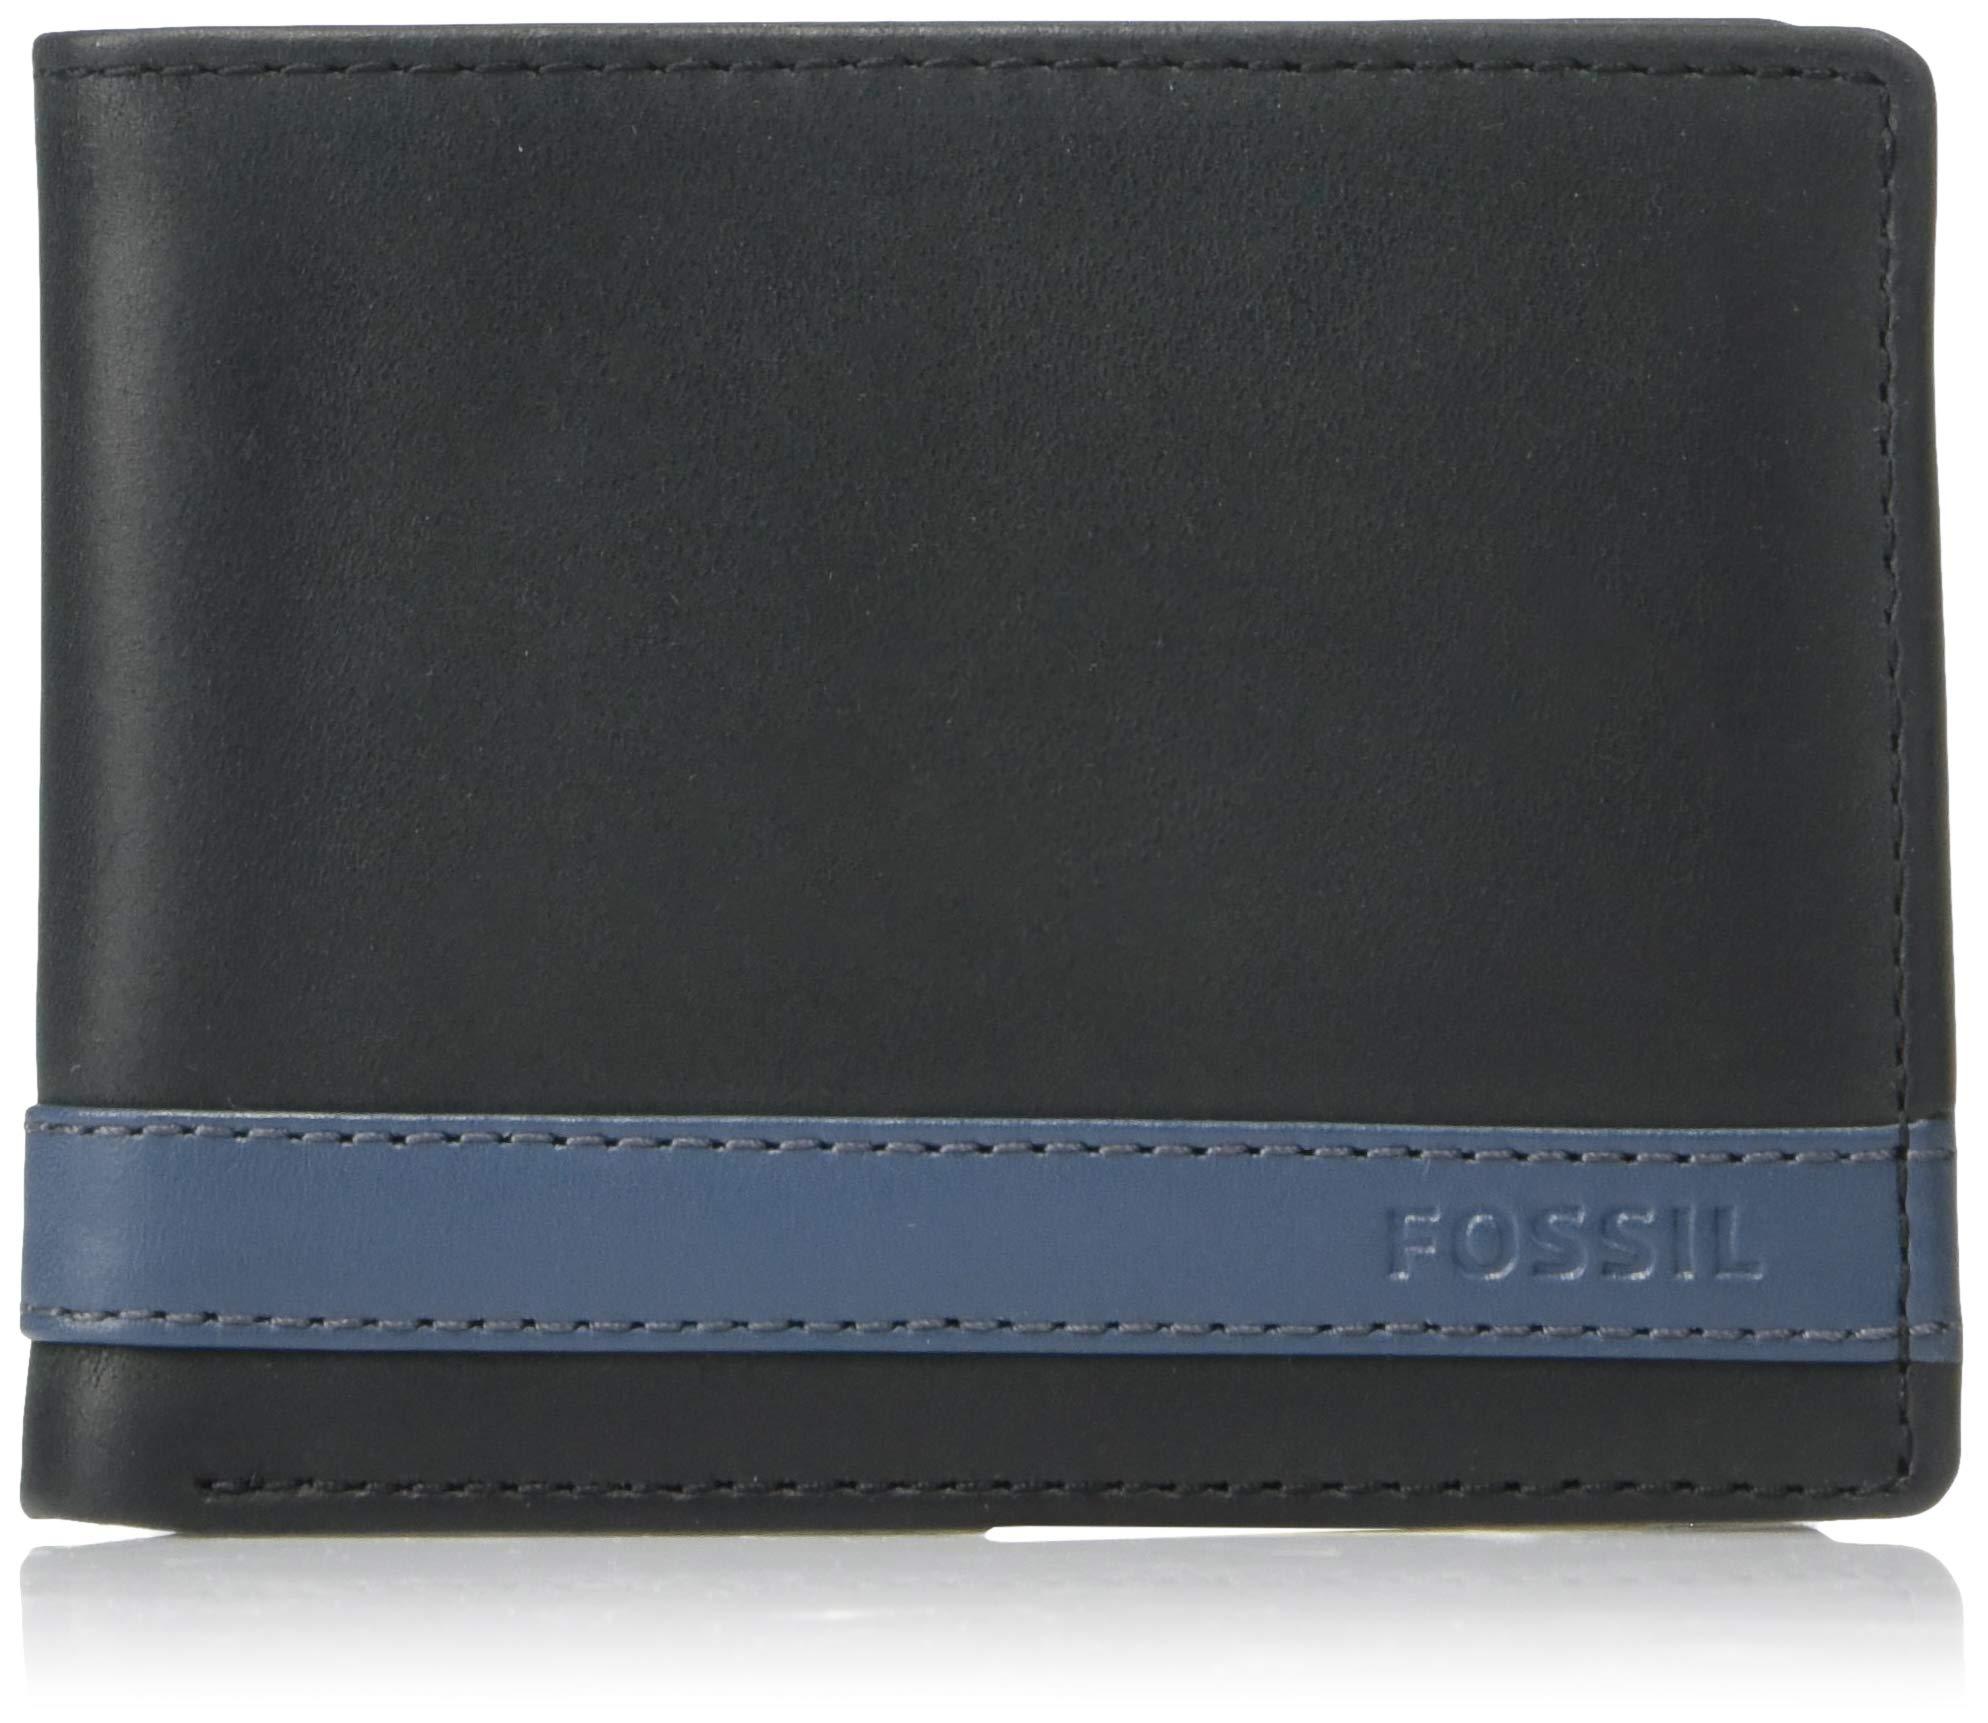 Fossil Men's Leather Bifold Flip ID Wallet by Fossil